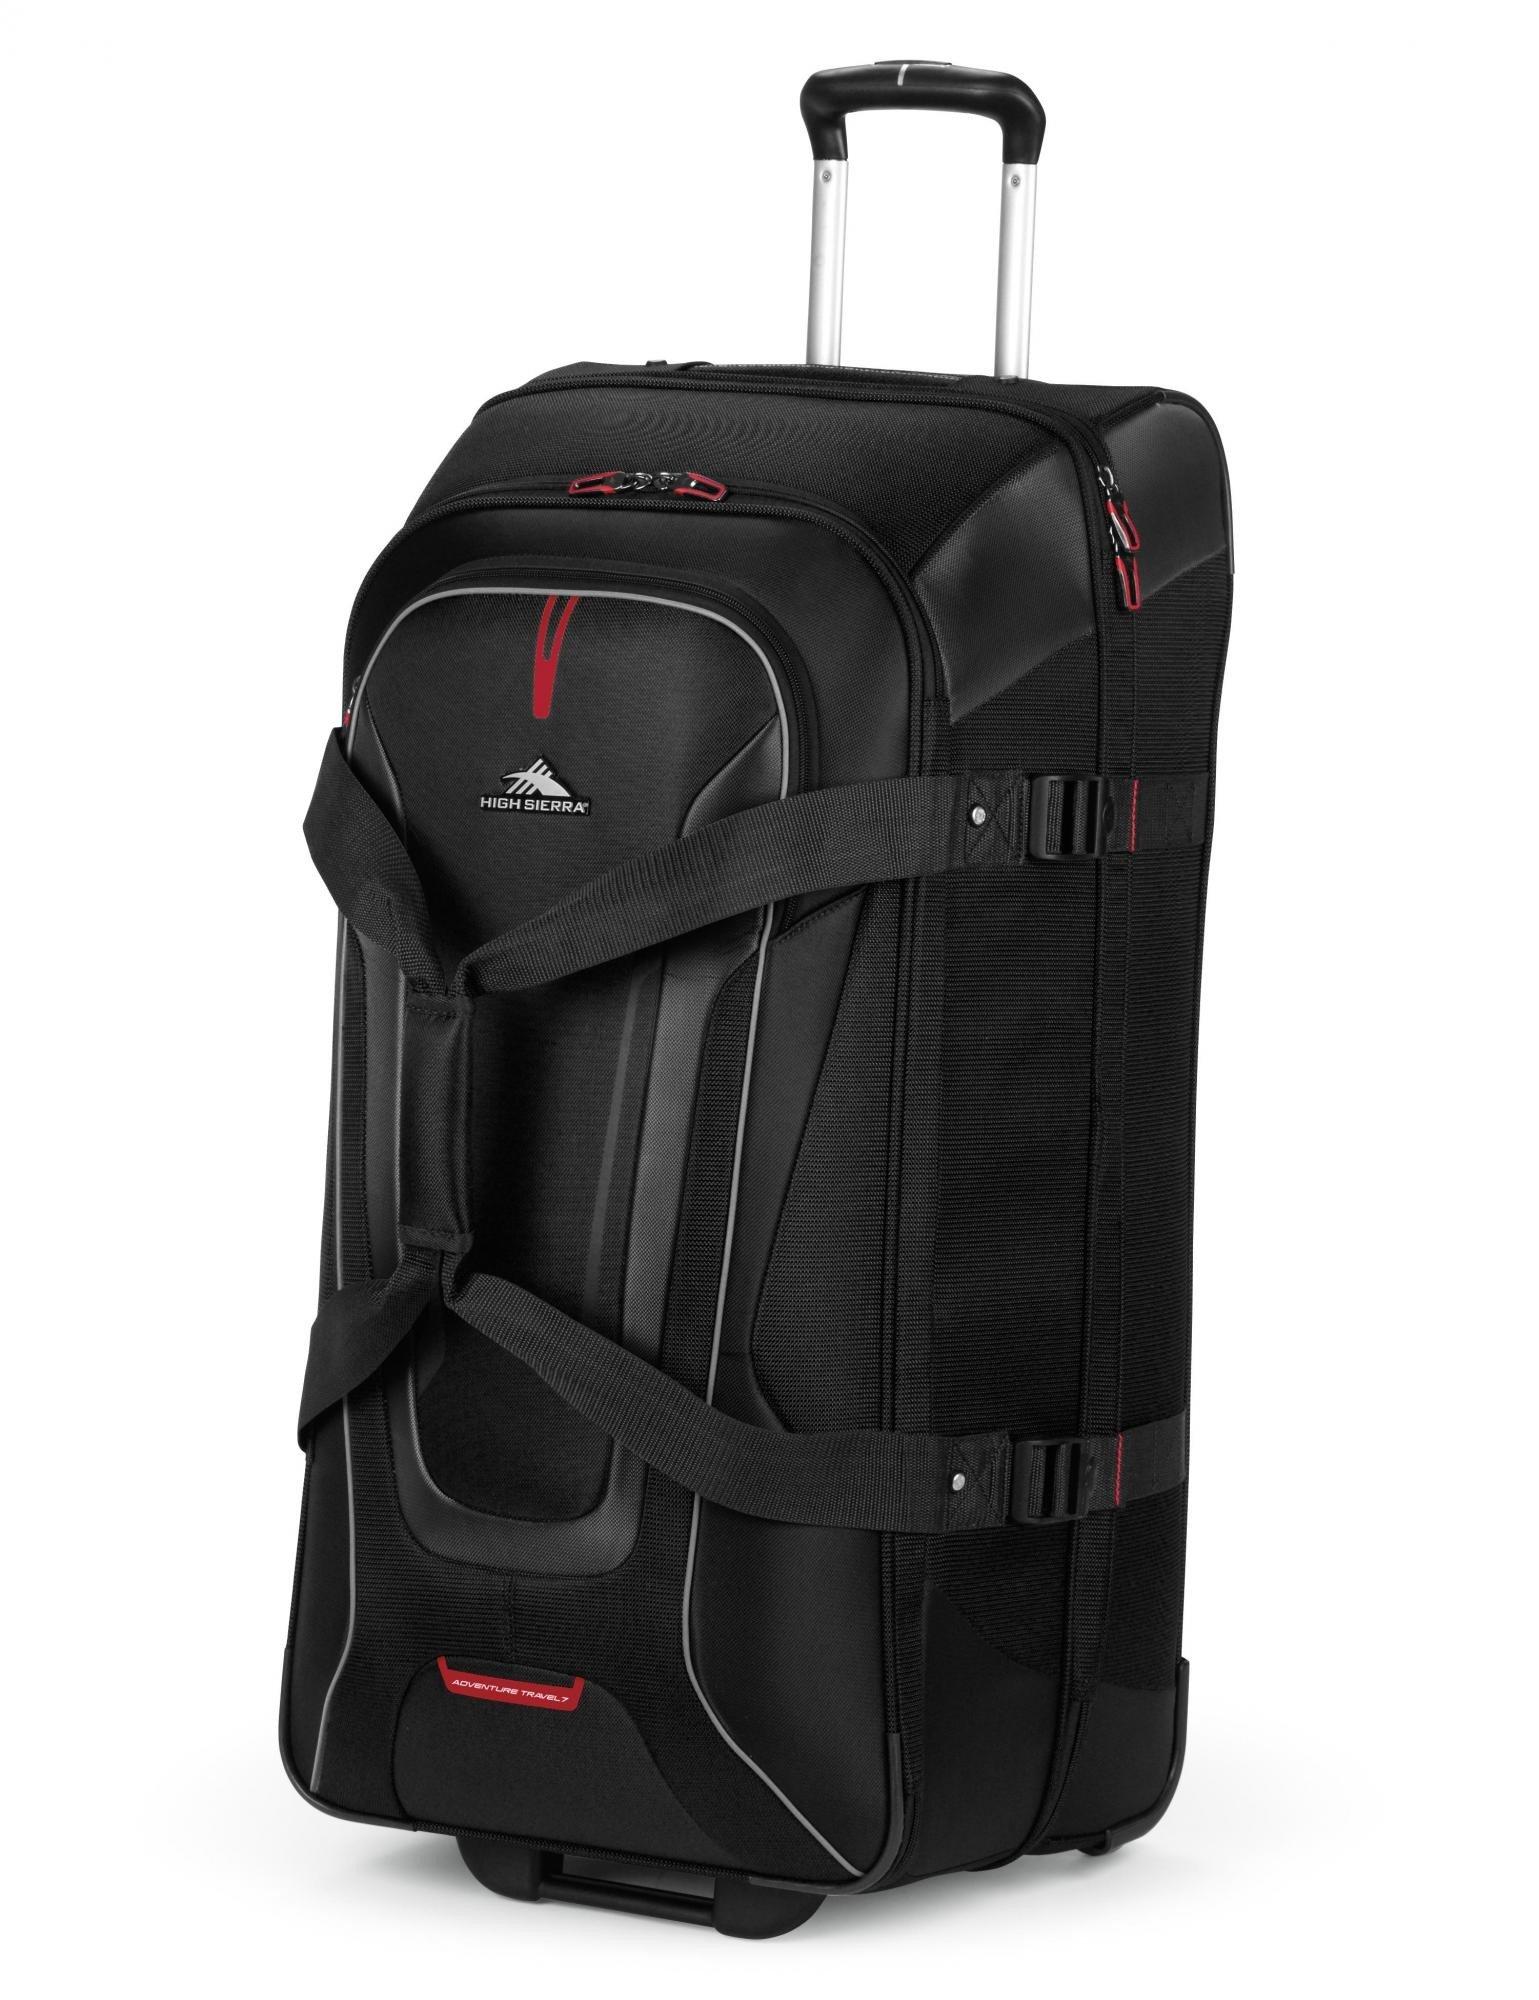 High Sierra AT7 Rolling Upright Duffel Bag (32-Inch, Black/Charcoal/Black)